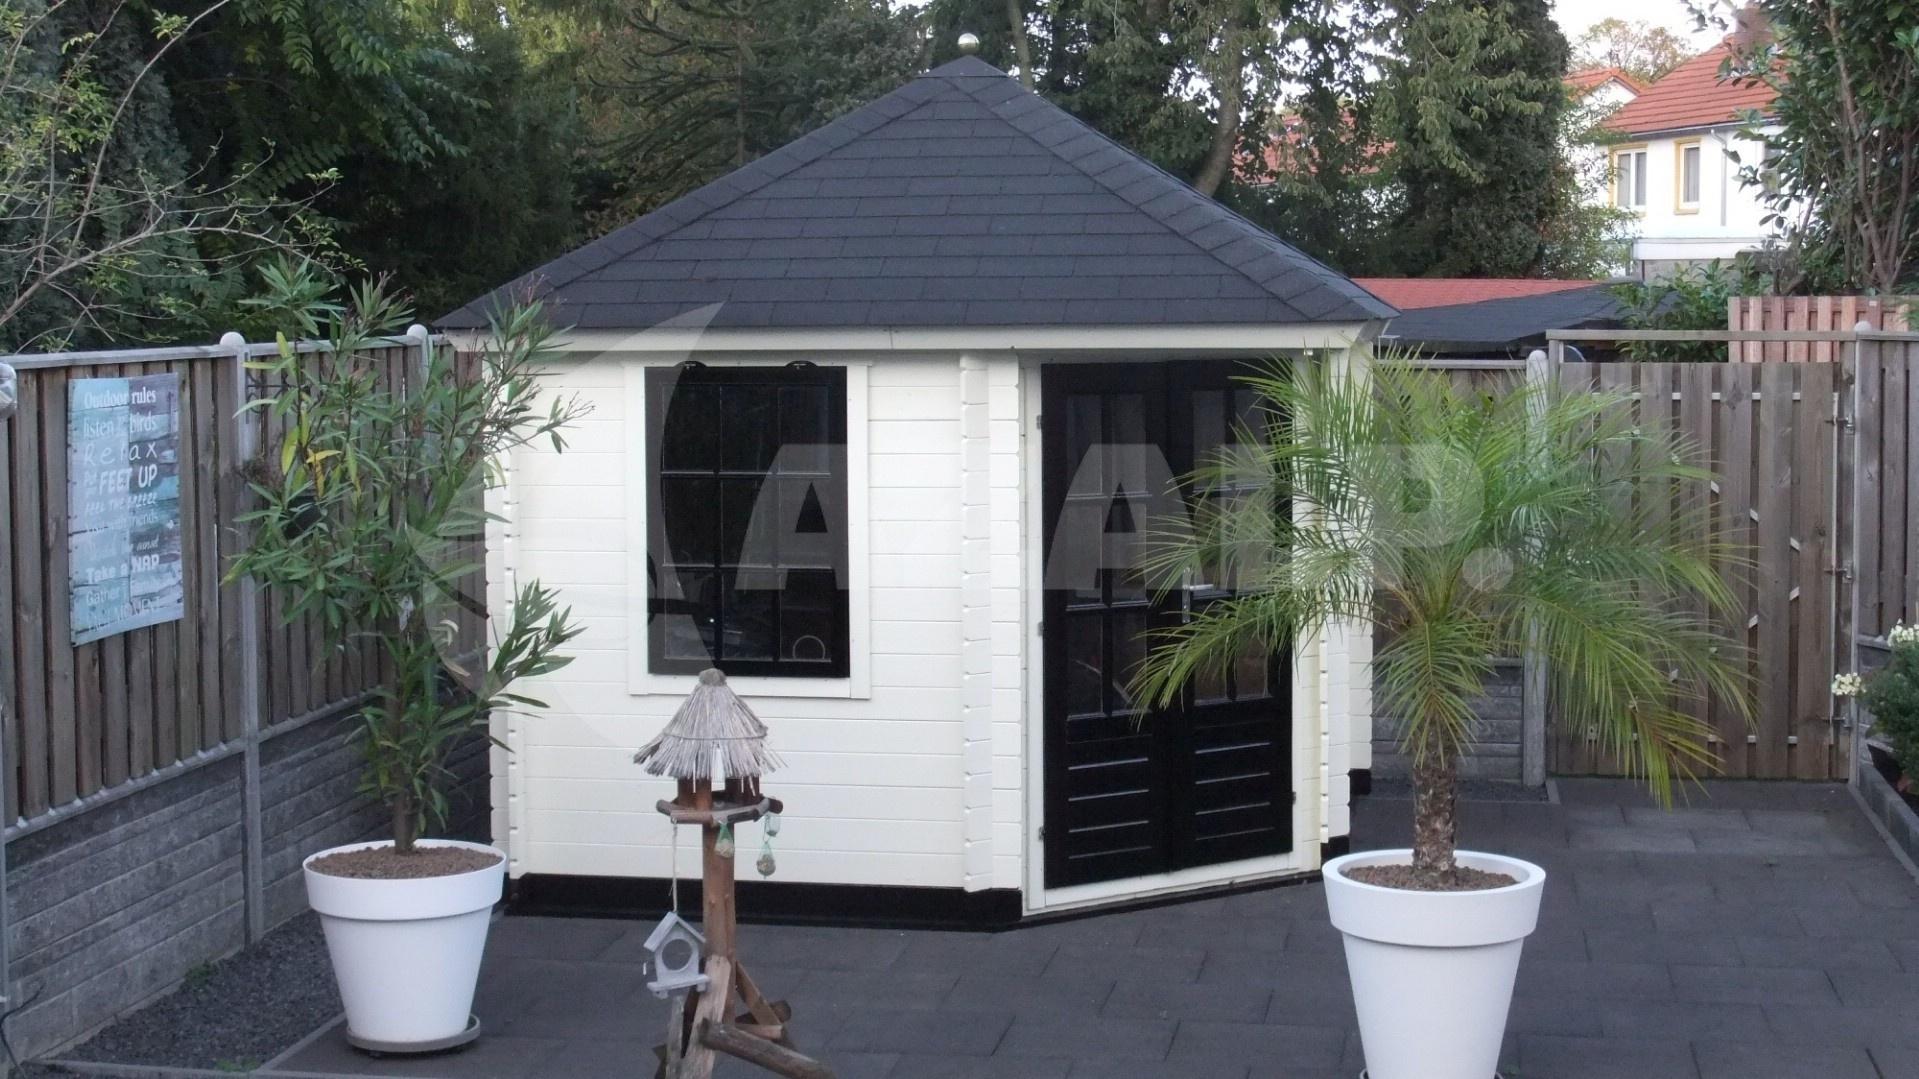 koopmans garant sb rahmwei 302 2 5l kaufen bei. Black Bedroom Furniture Sets. Home Design Ideas